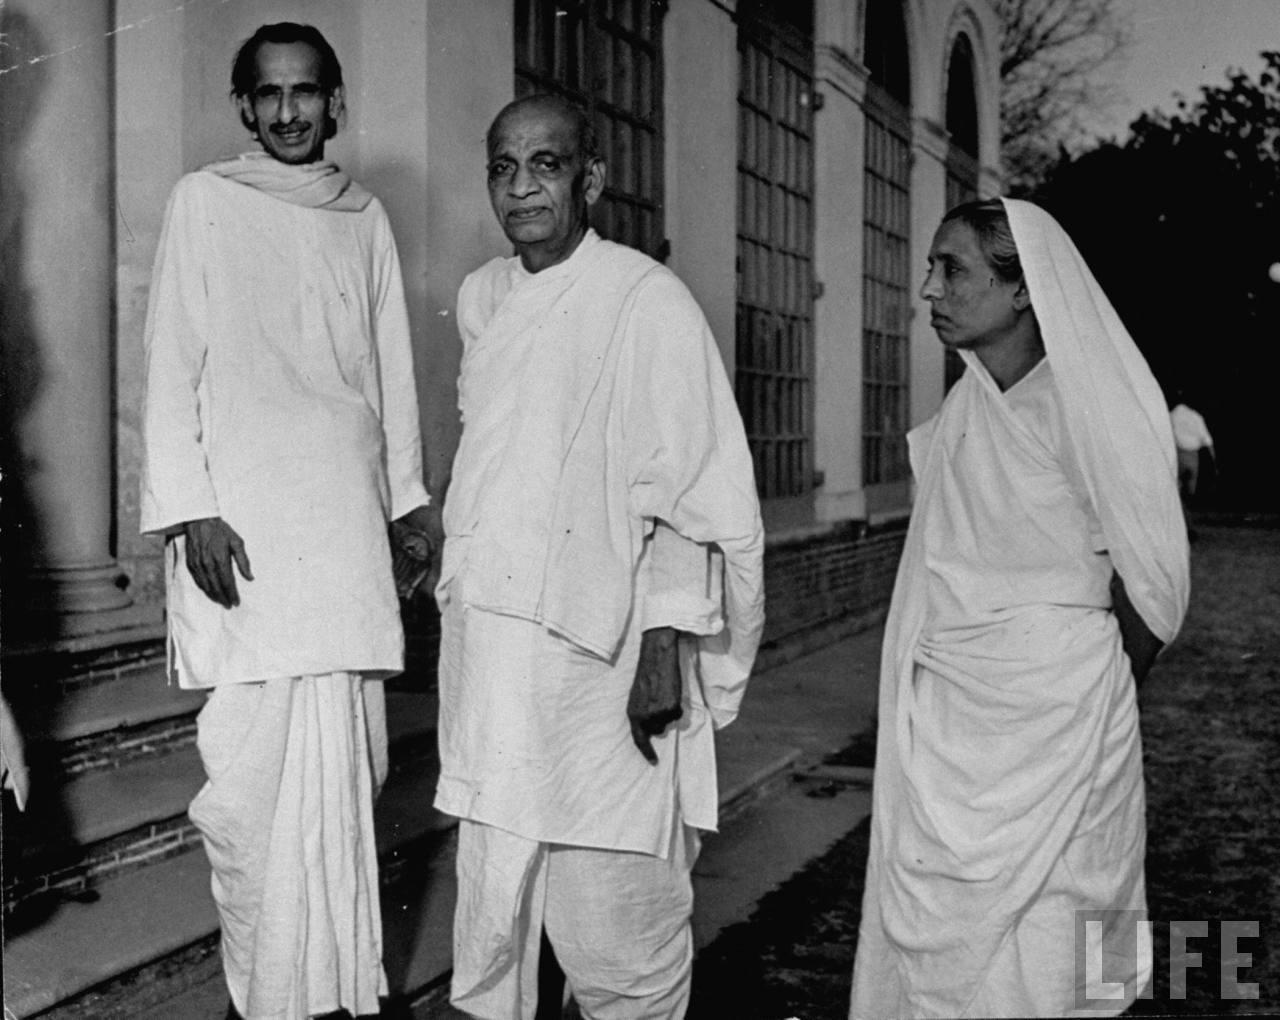 Kripalani (L) with Sardar Vallabhai Patel and Manibehn Patel. Credit: Wikimedia Commons